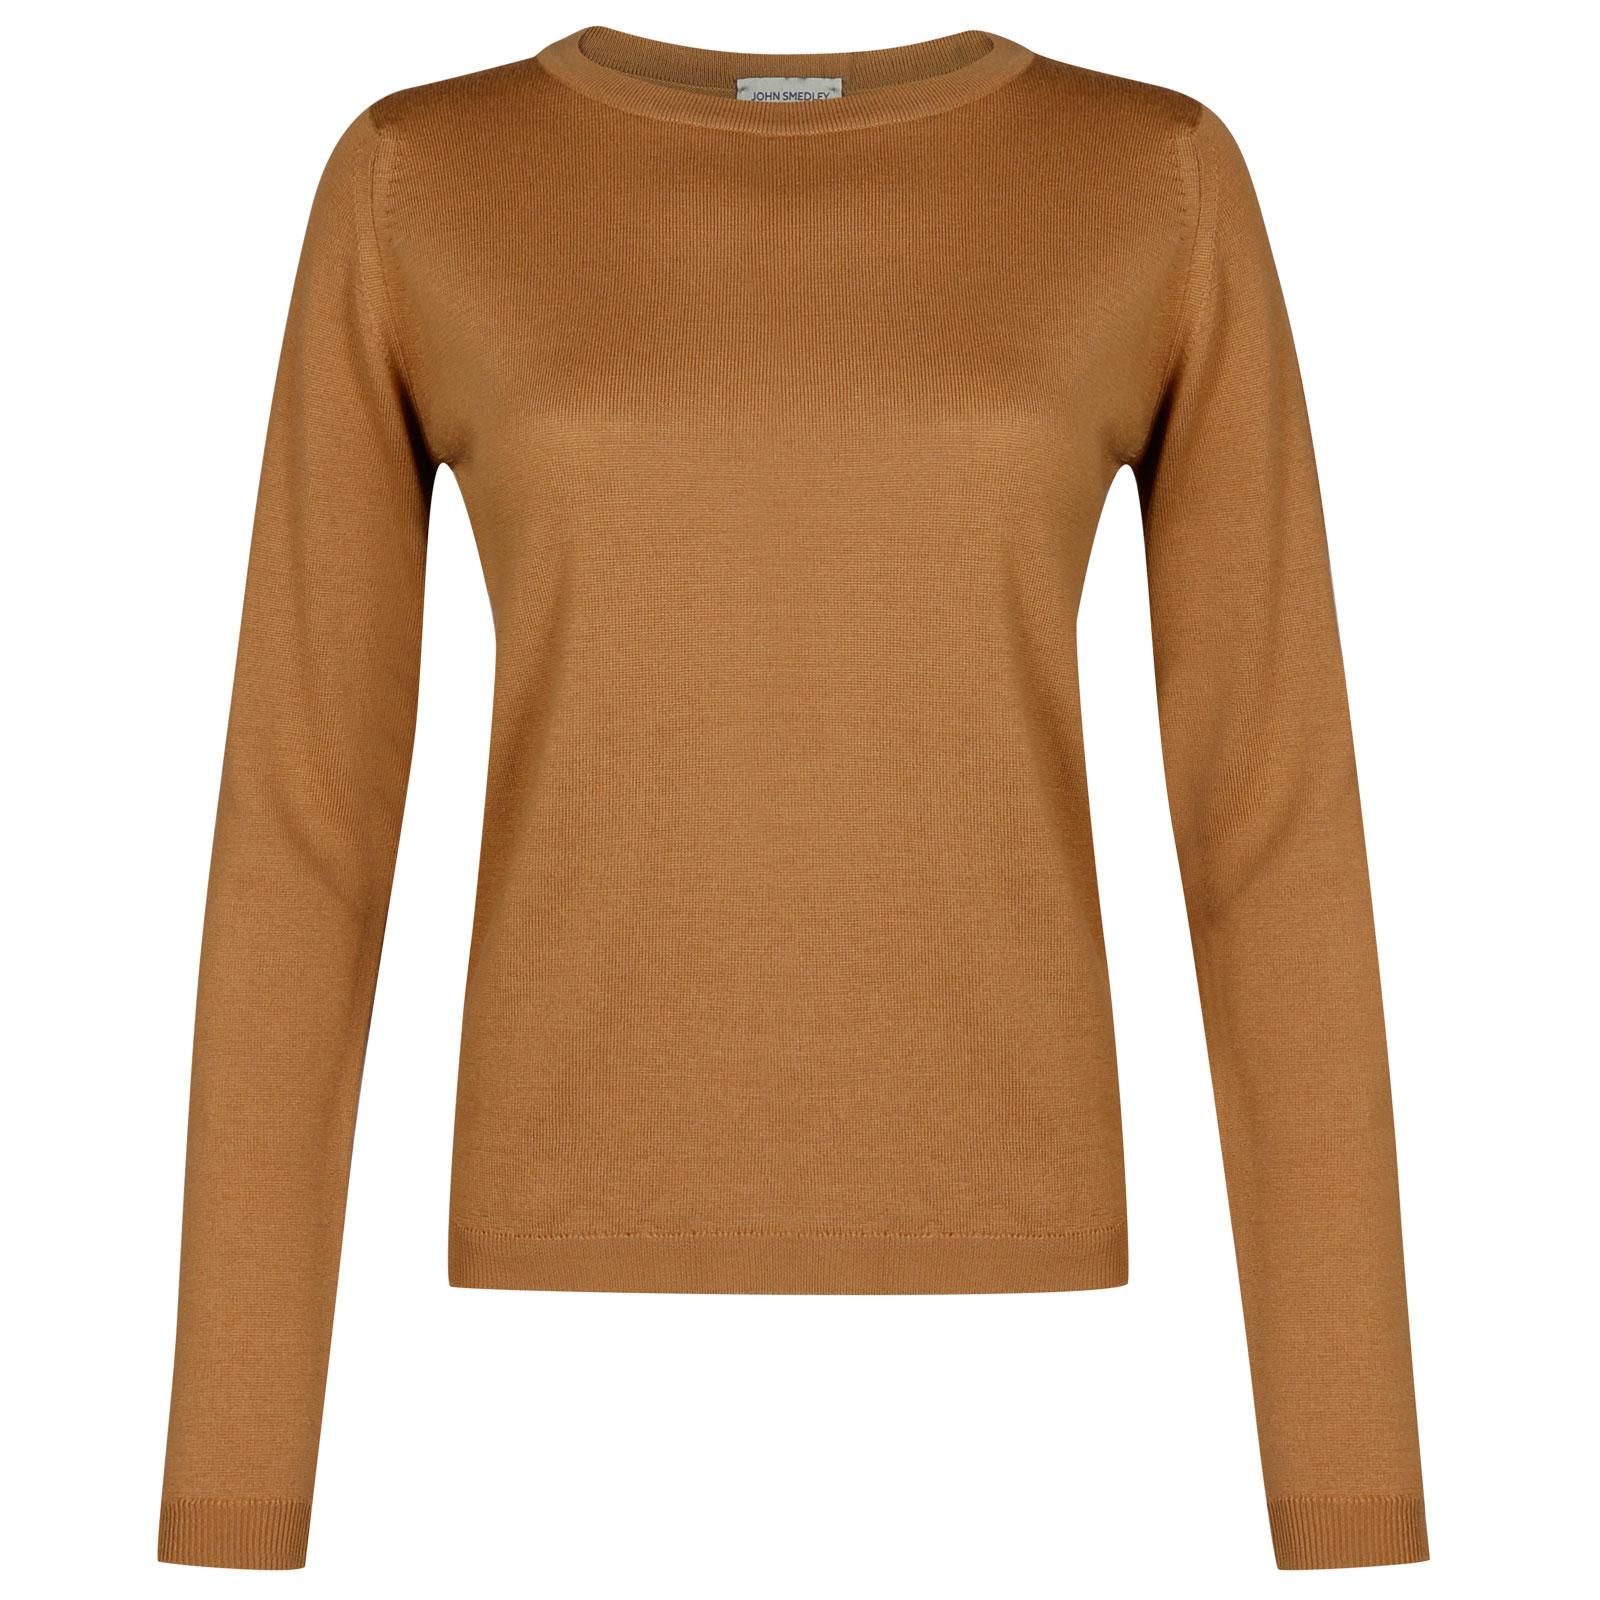 John Smedley Edmee Merino Wool Sweater in Camel-S